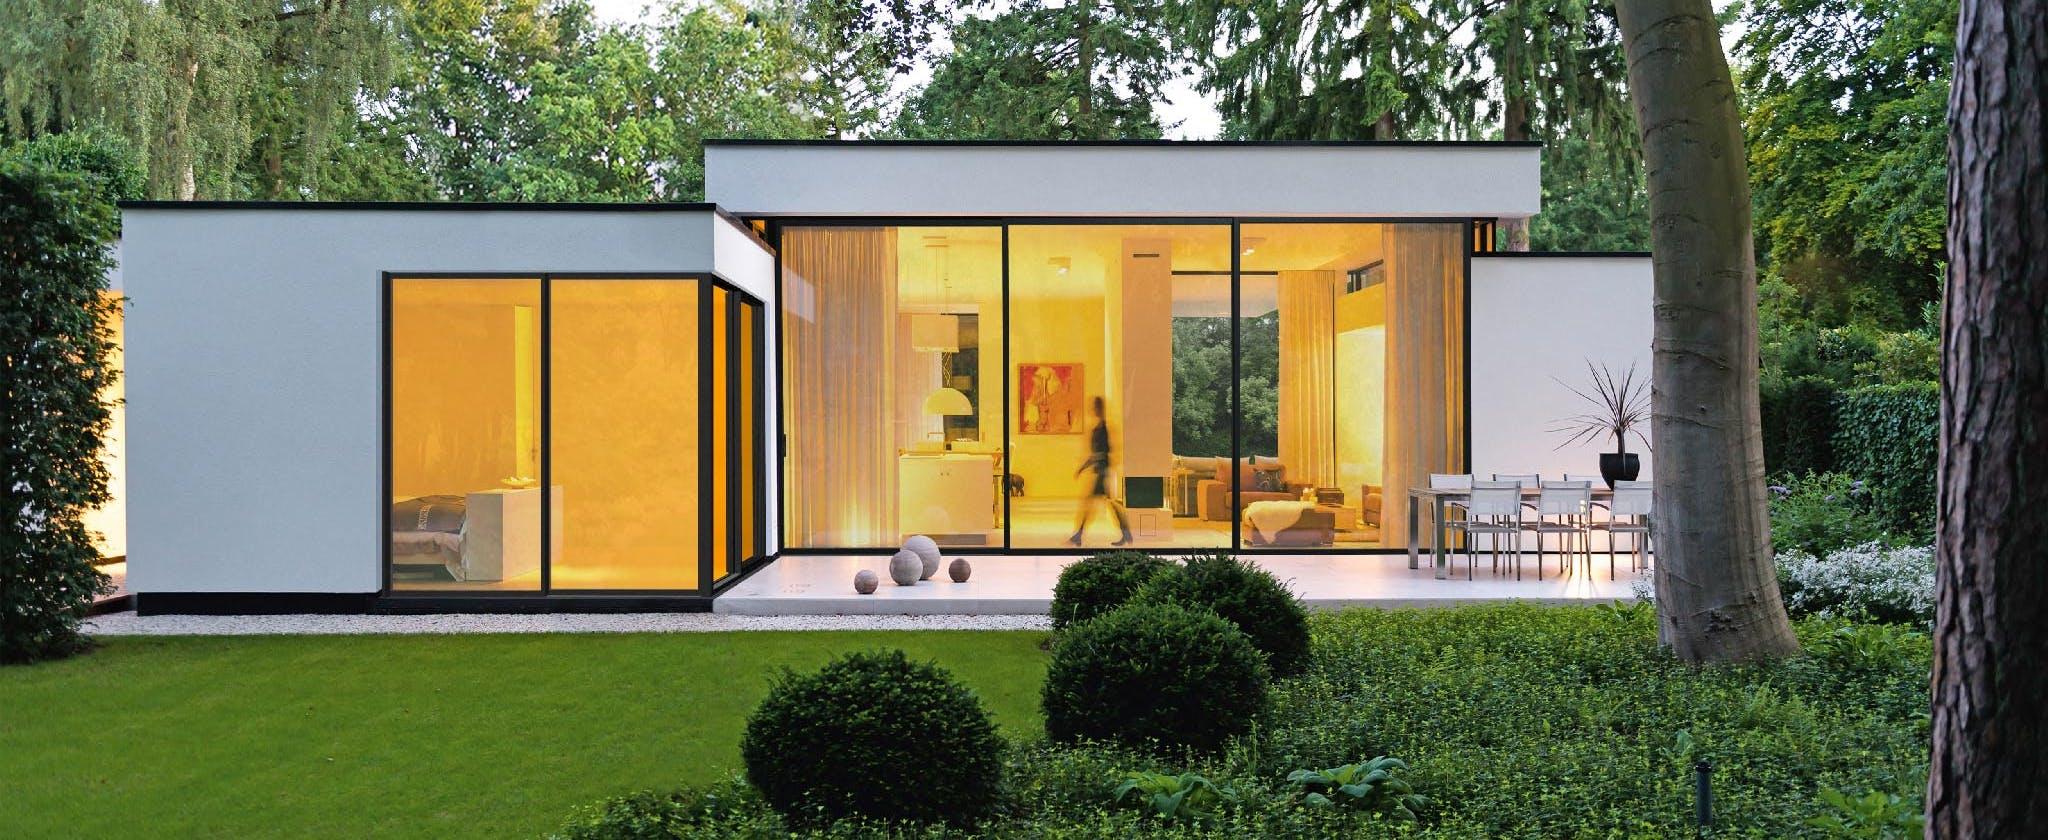 Minimal Sliding Glass Walls